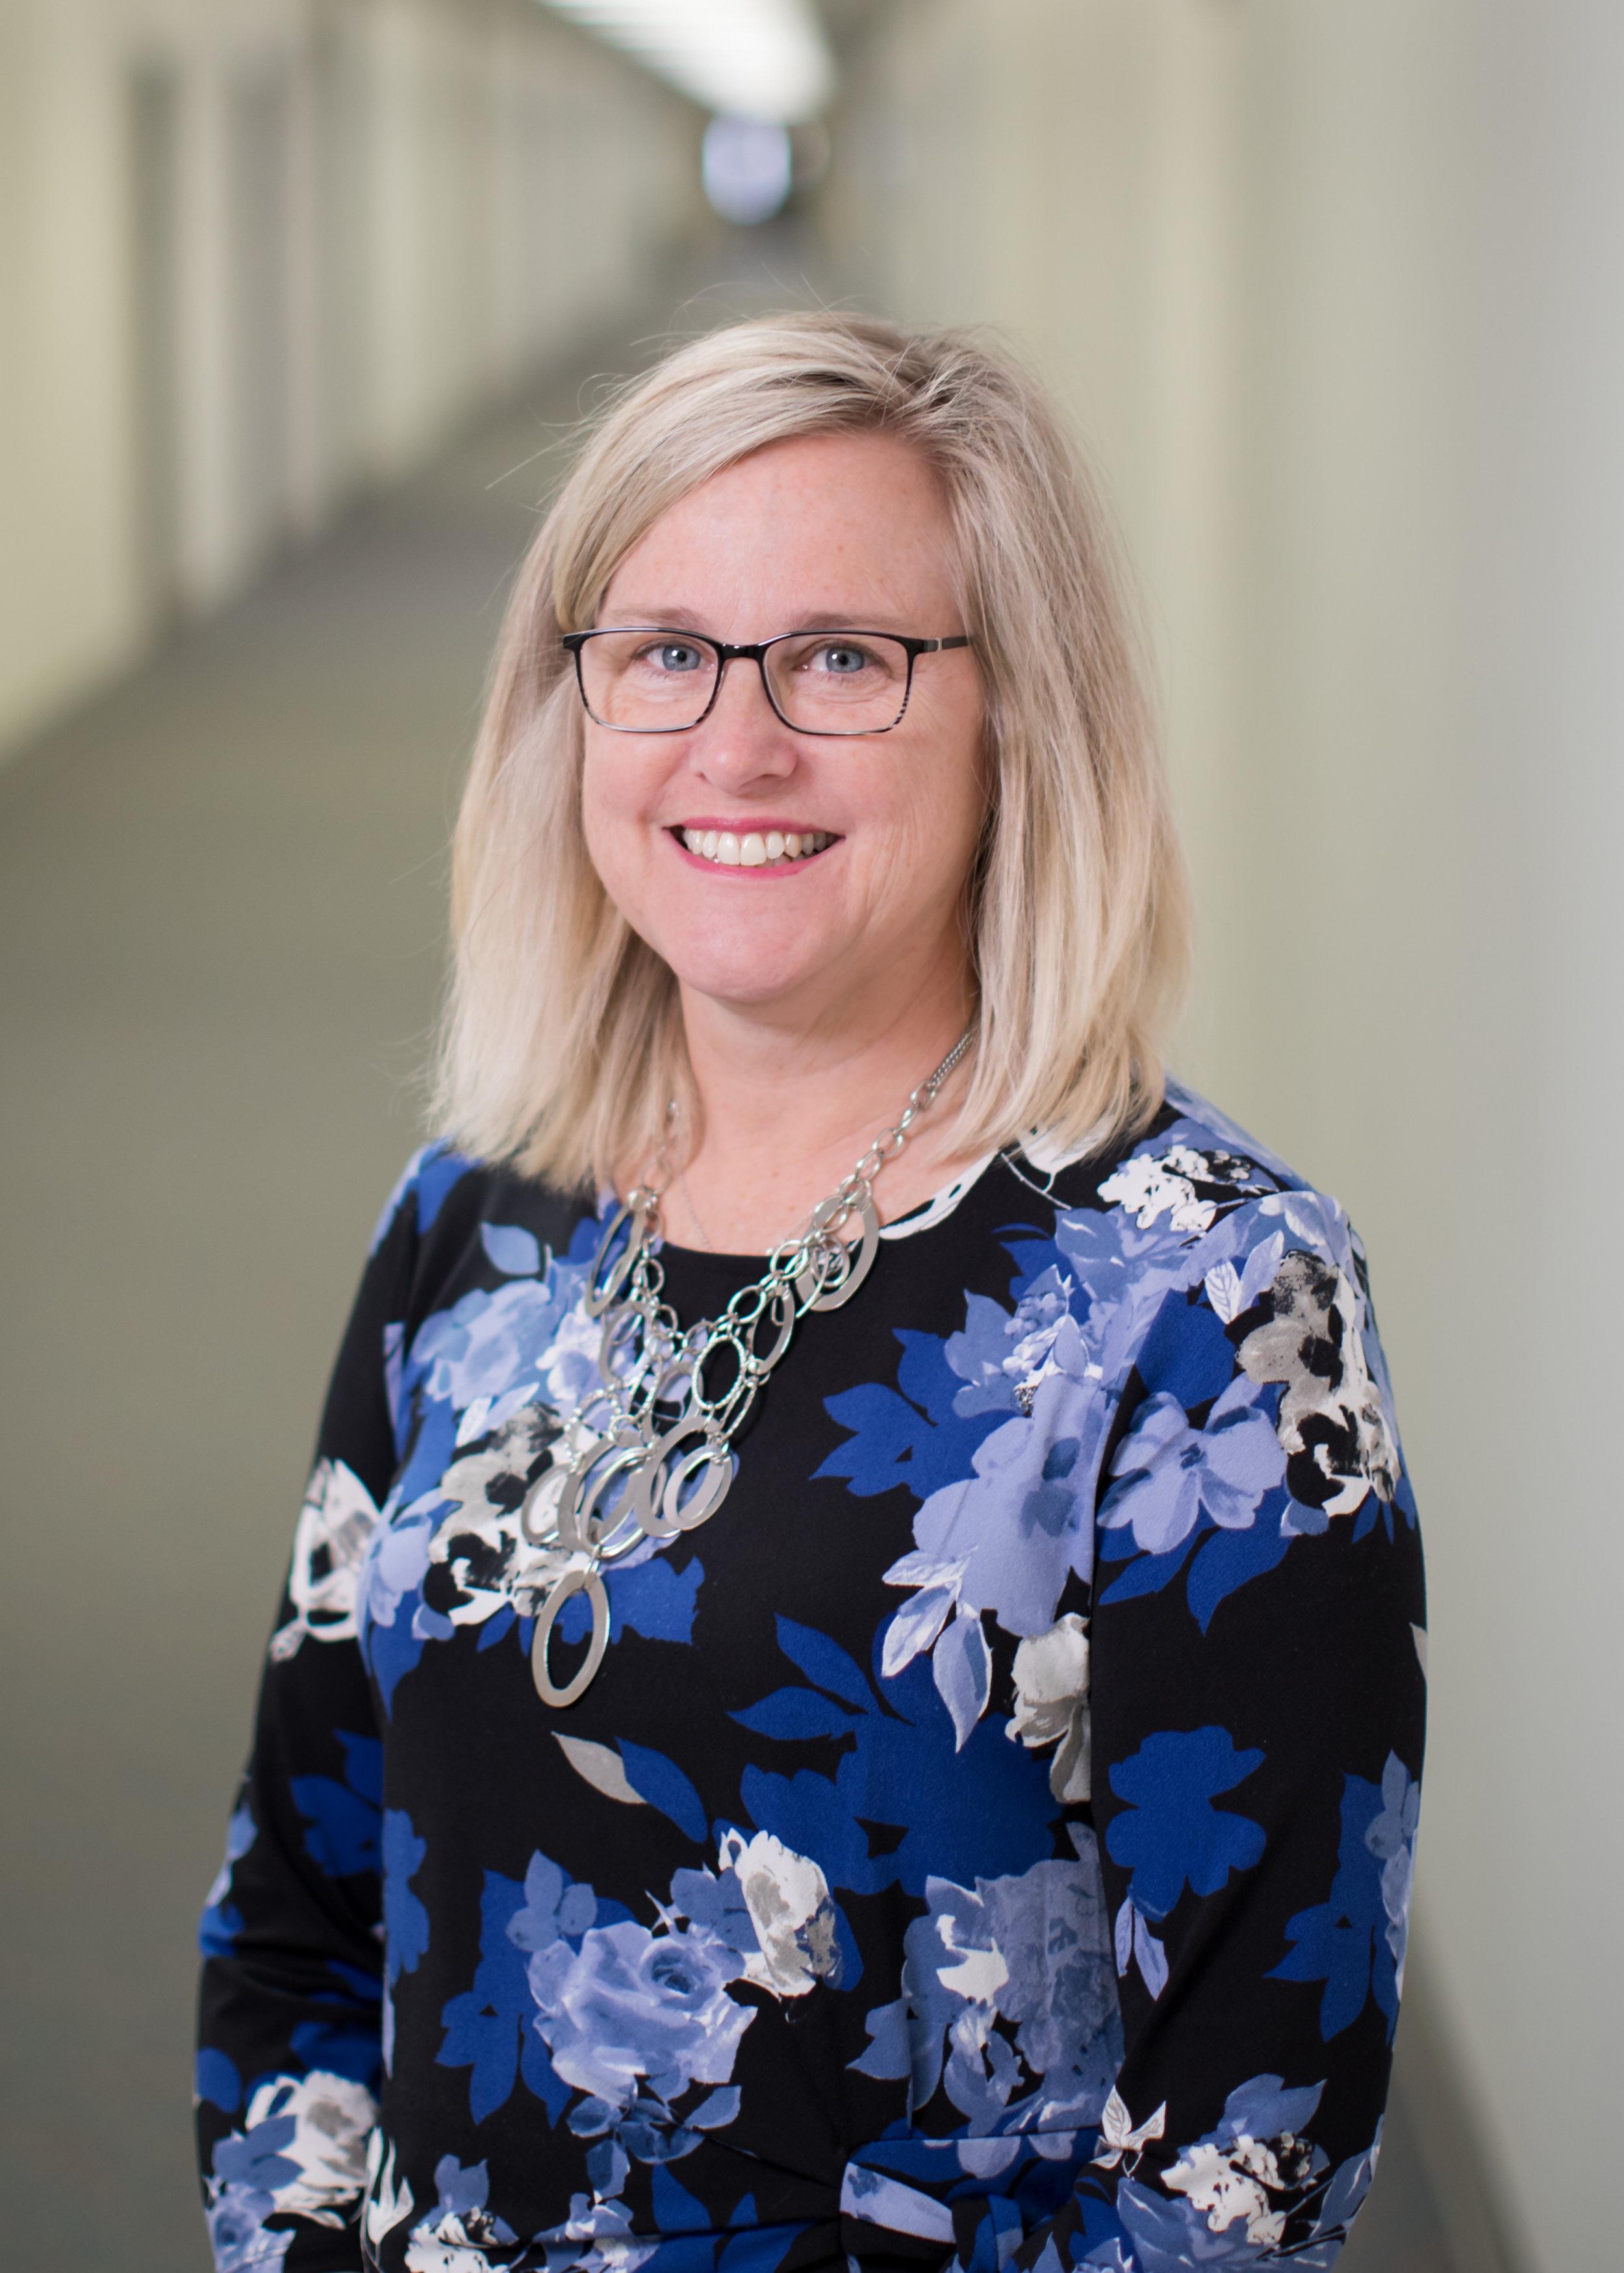 Debra Menchaca - Administrative Assistant